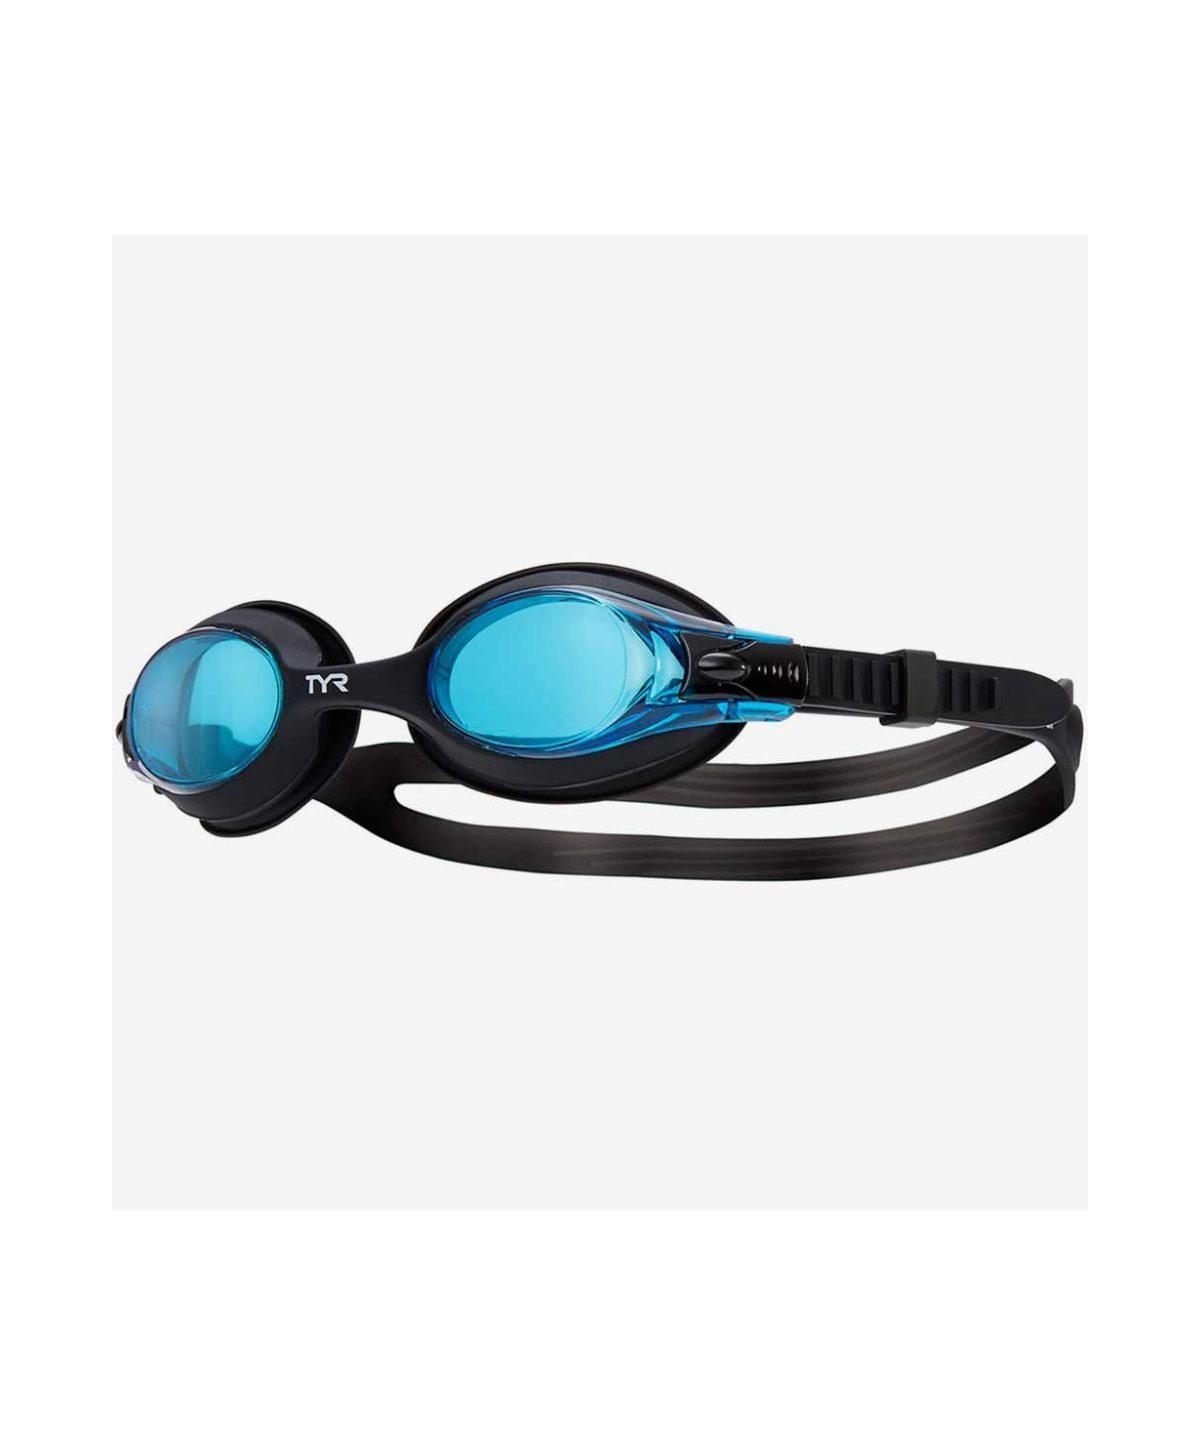 TYR Kids Swimple Очки для плавания  16420 - 1